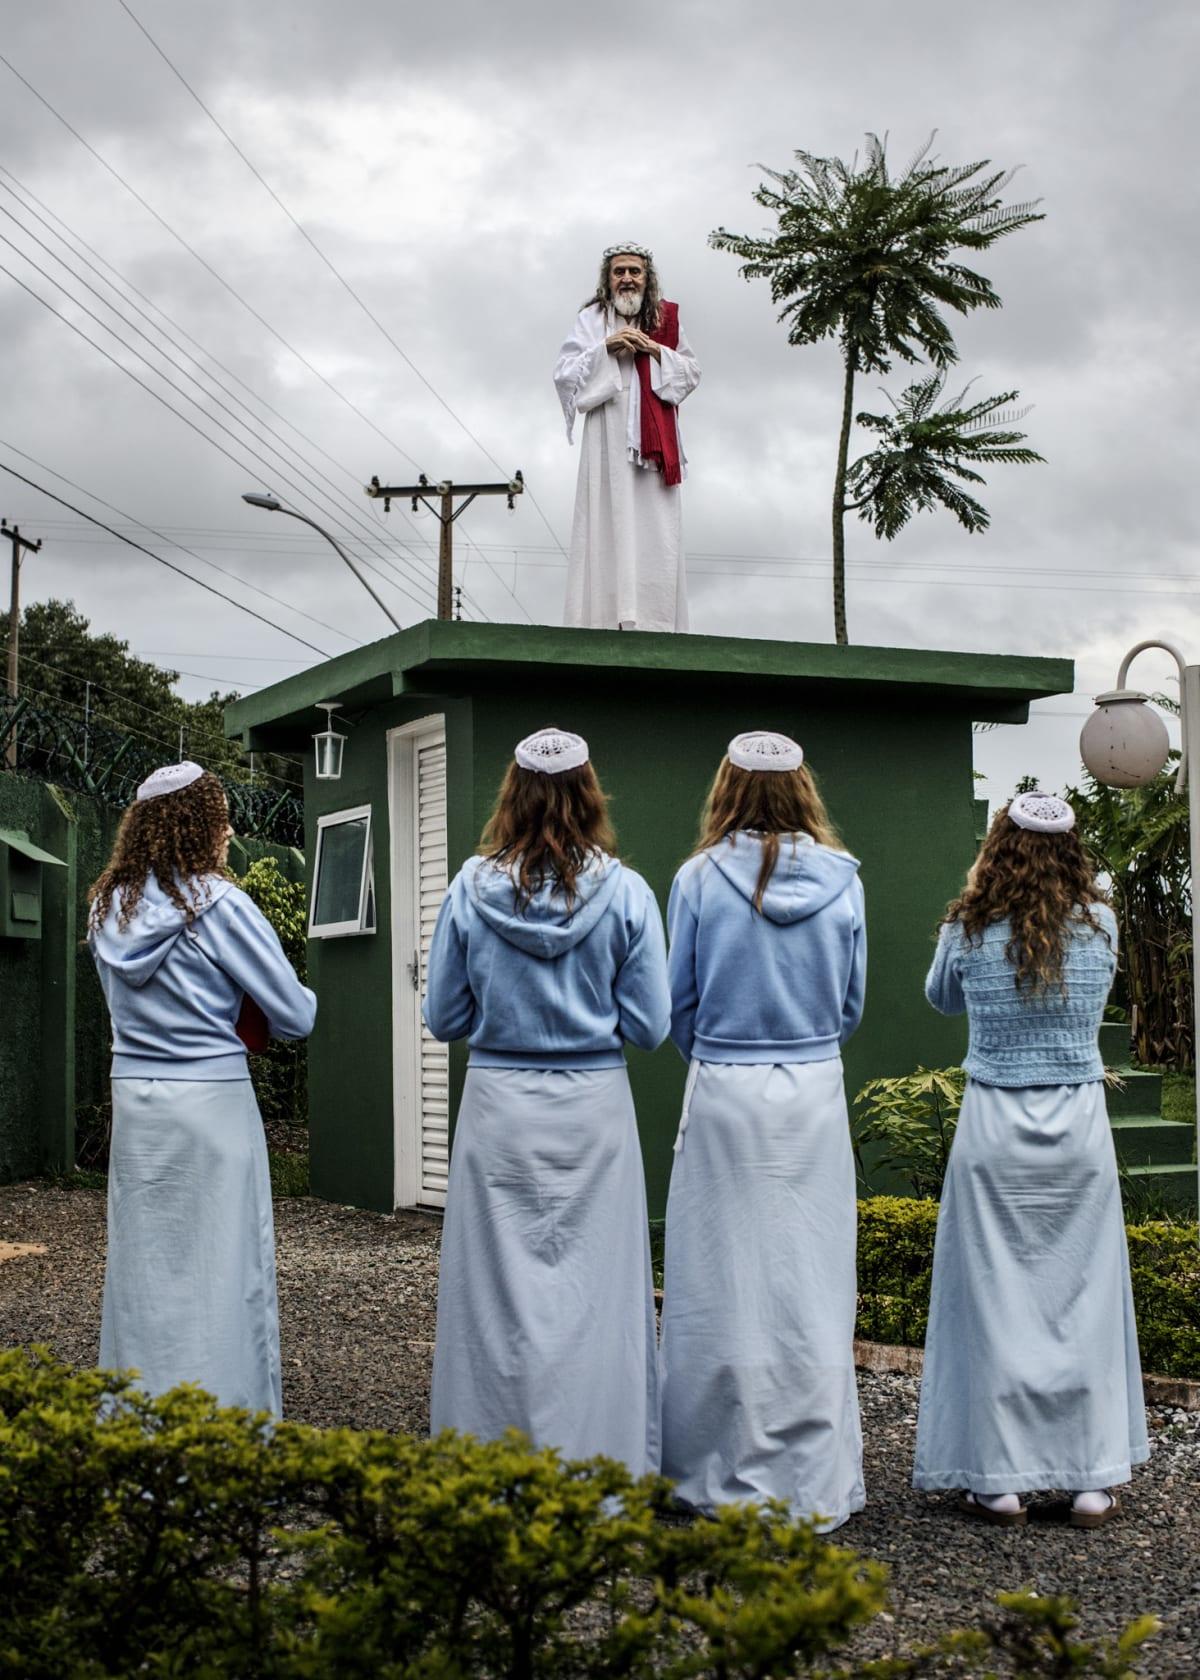 Jonas Bendiksen, INRI Cristo giving a sermony, Brazil, 2014